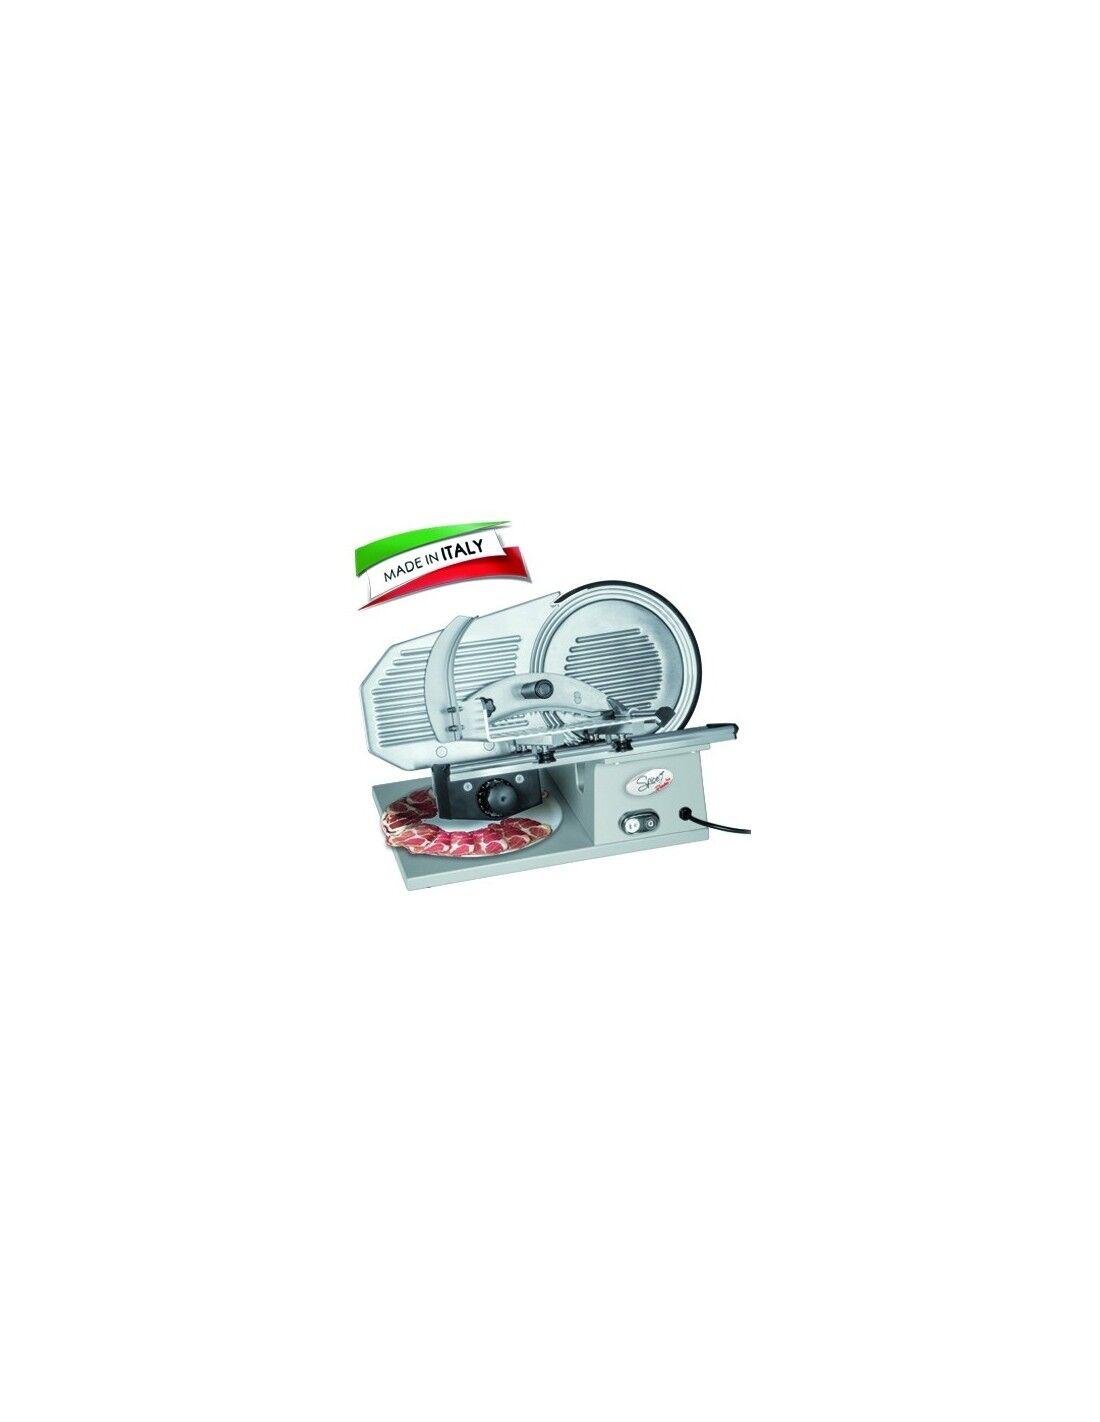 SPICE Electronics Affettatrice Professionale Paprika Gourmet Pro 22 lama 25 cm 160 w